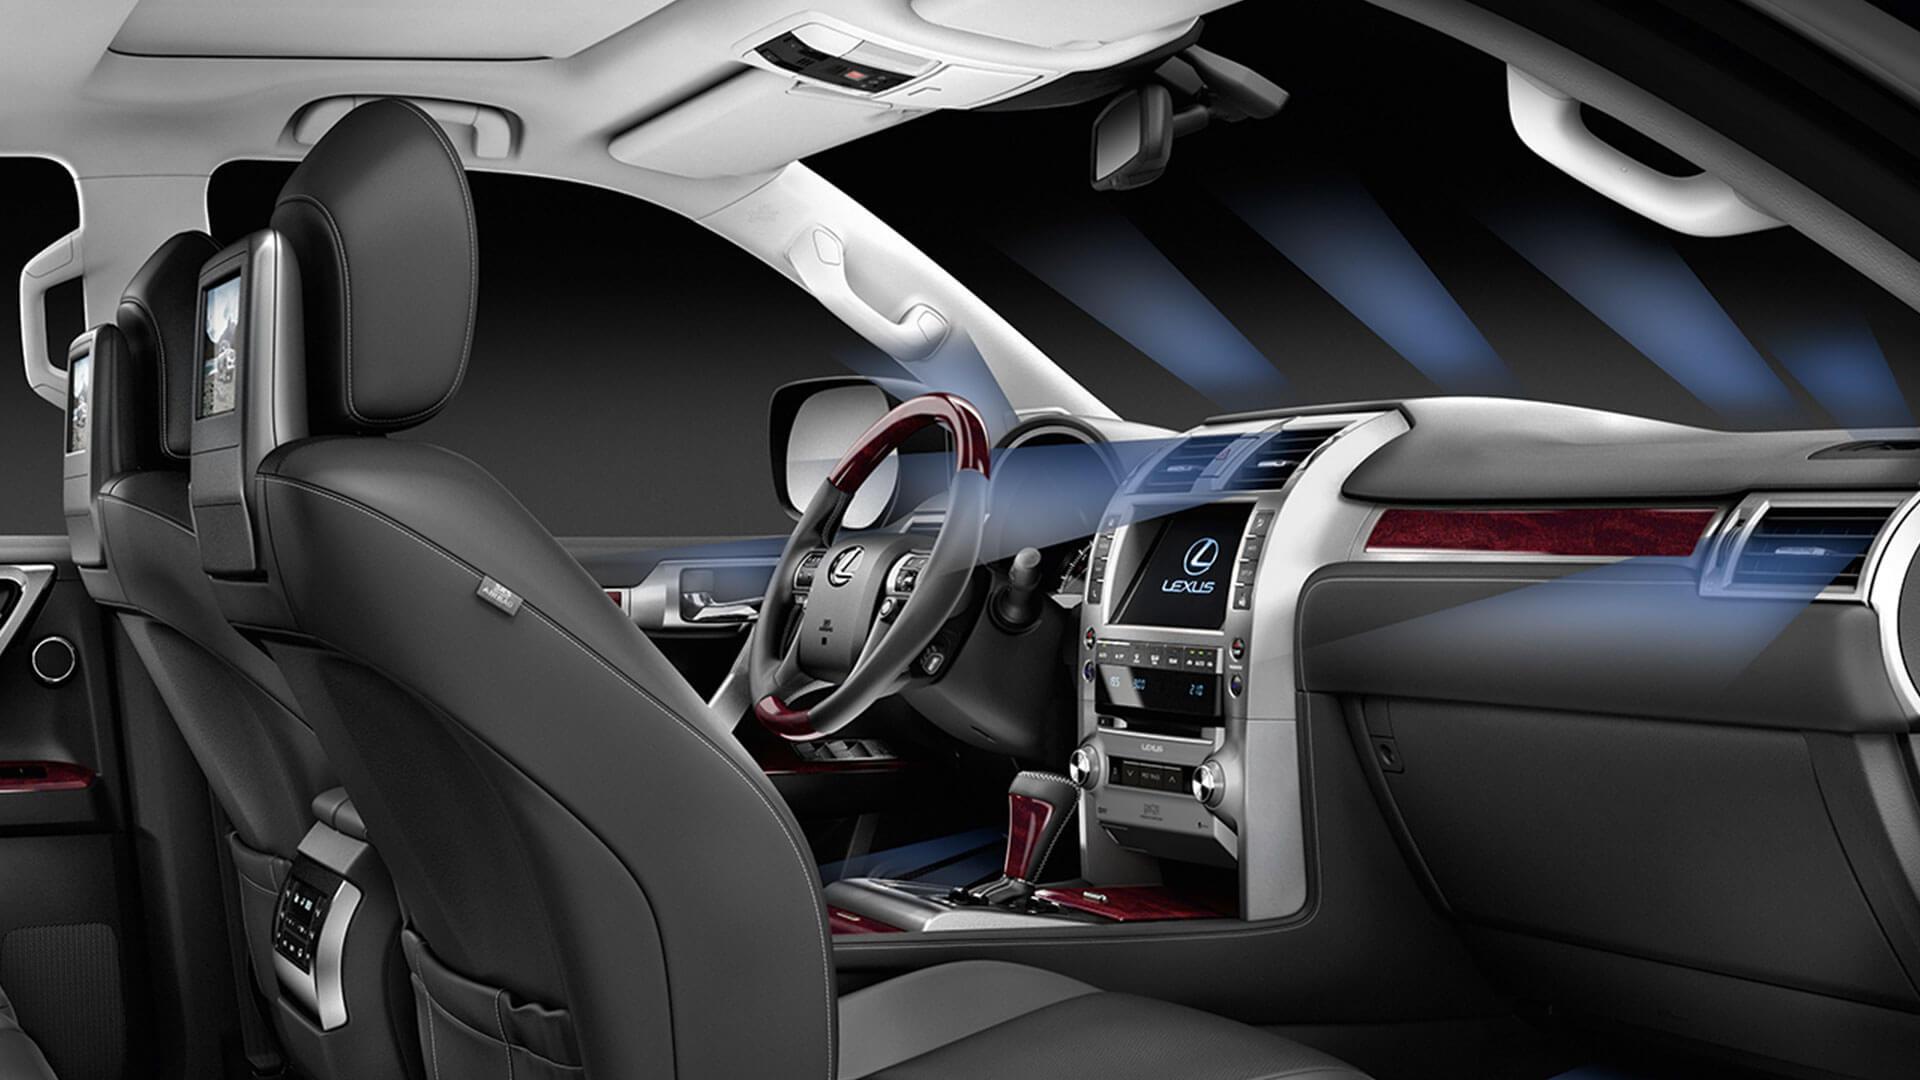 2017 lexus gx 460 features heated windscreen